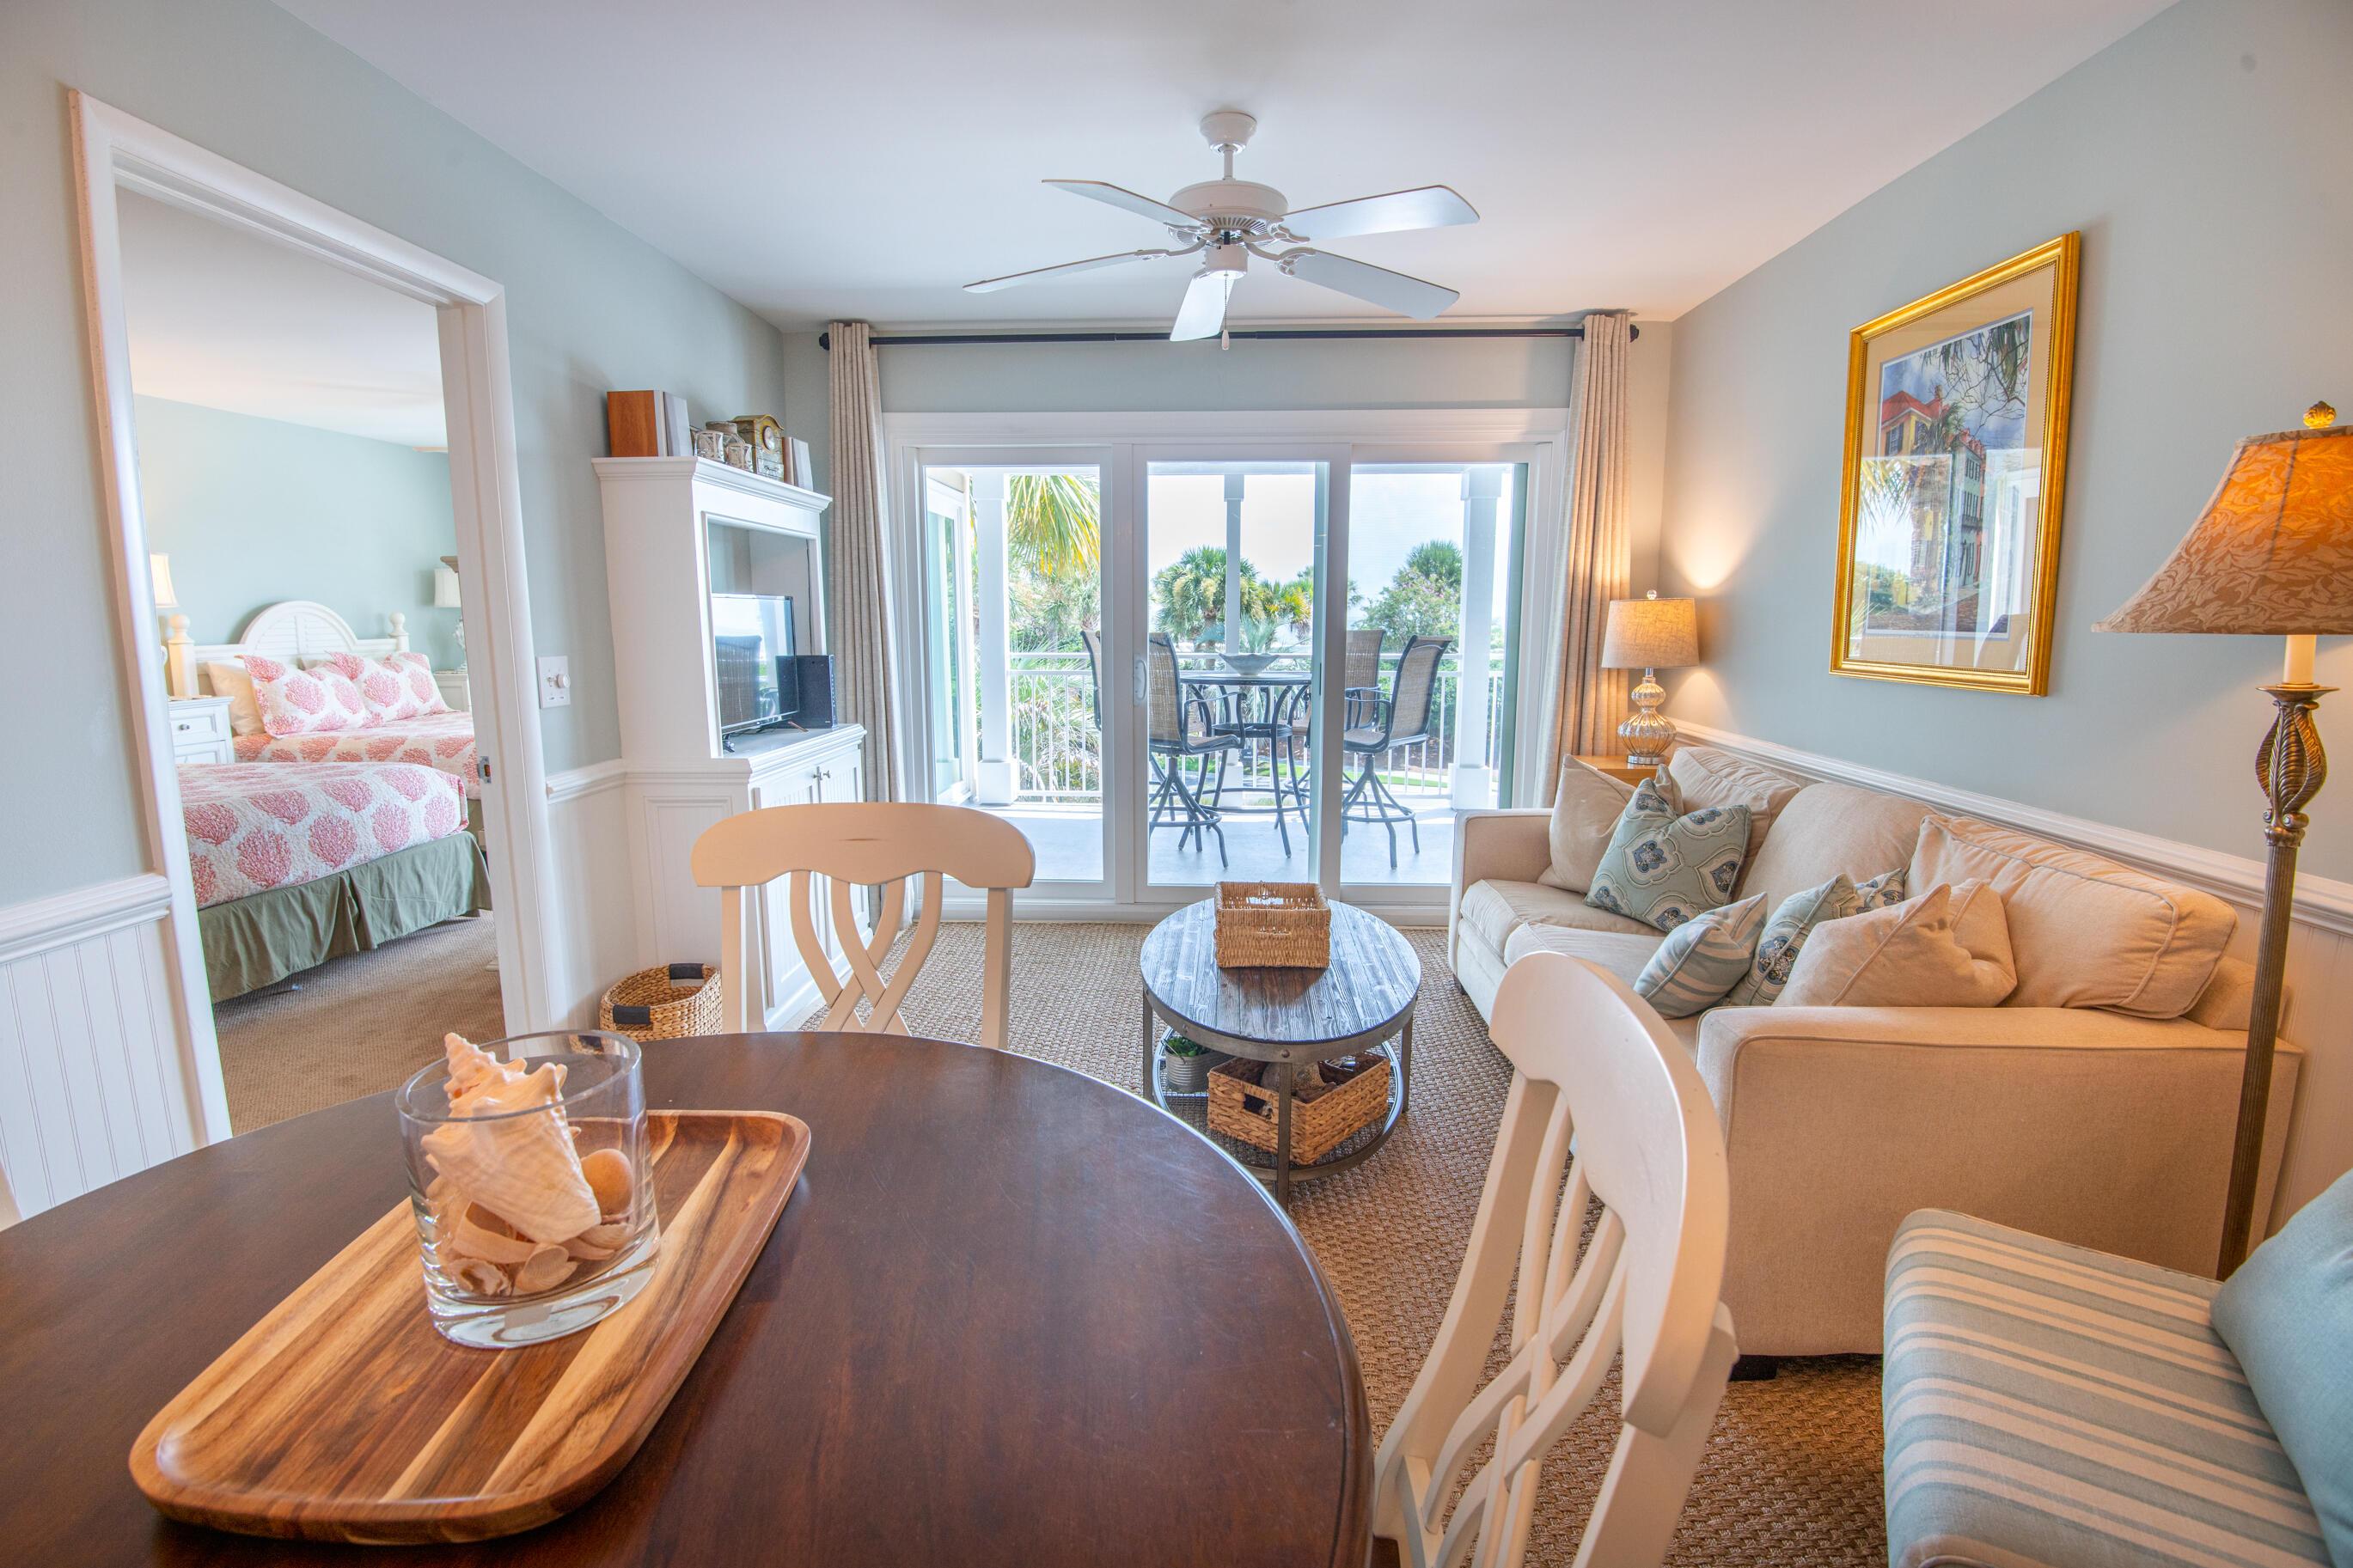 Atrium Villas Homes For Sale - 2935 Atrium Villa, Seabrook Island, SC - 13